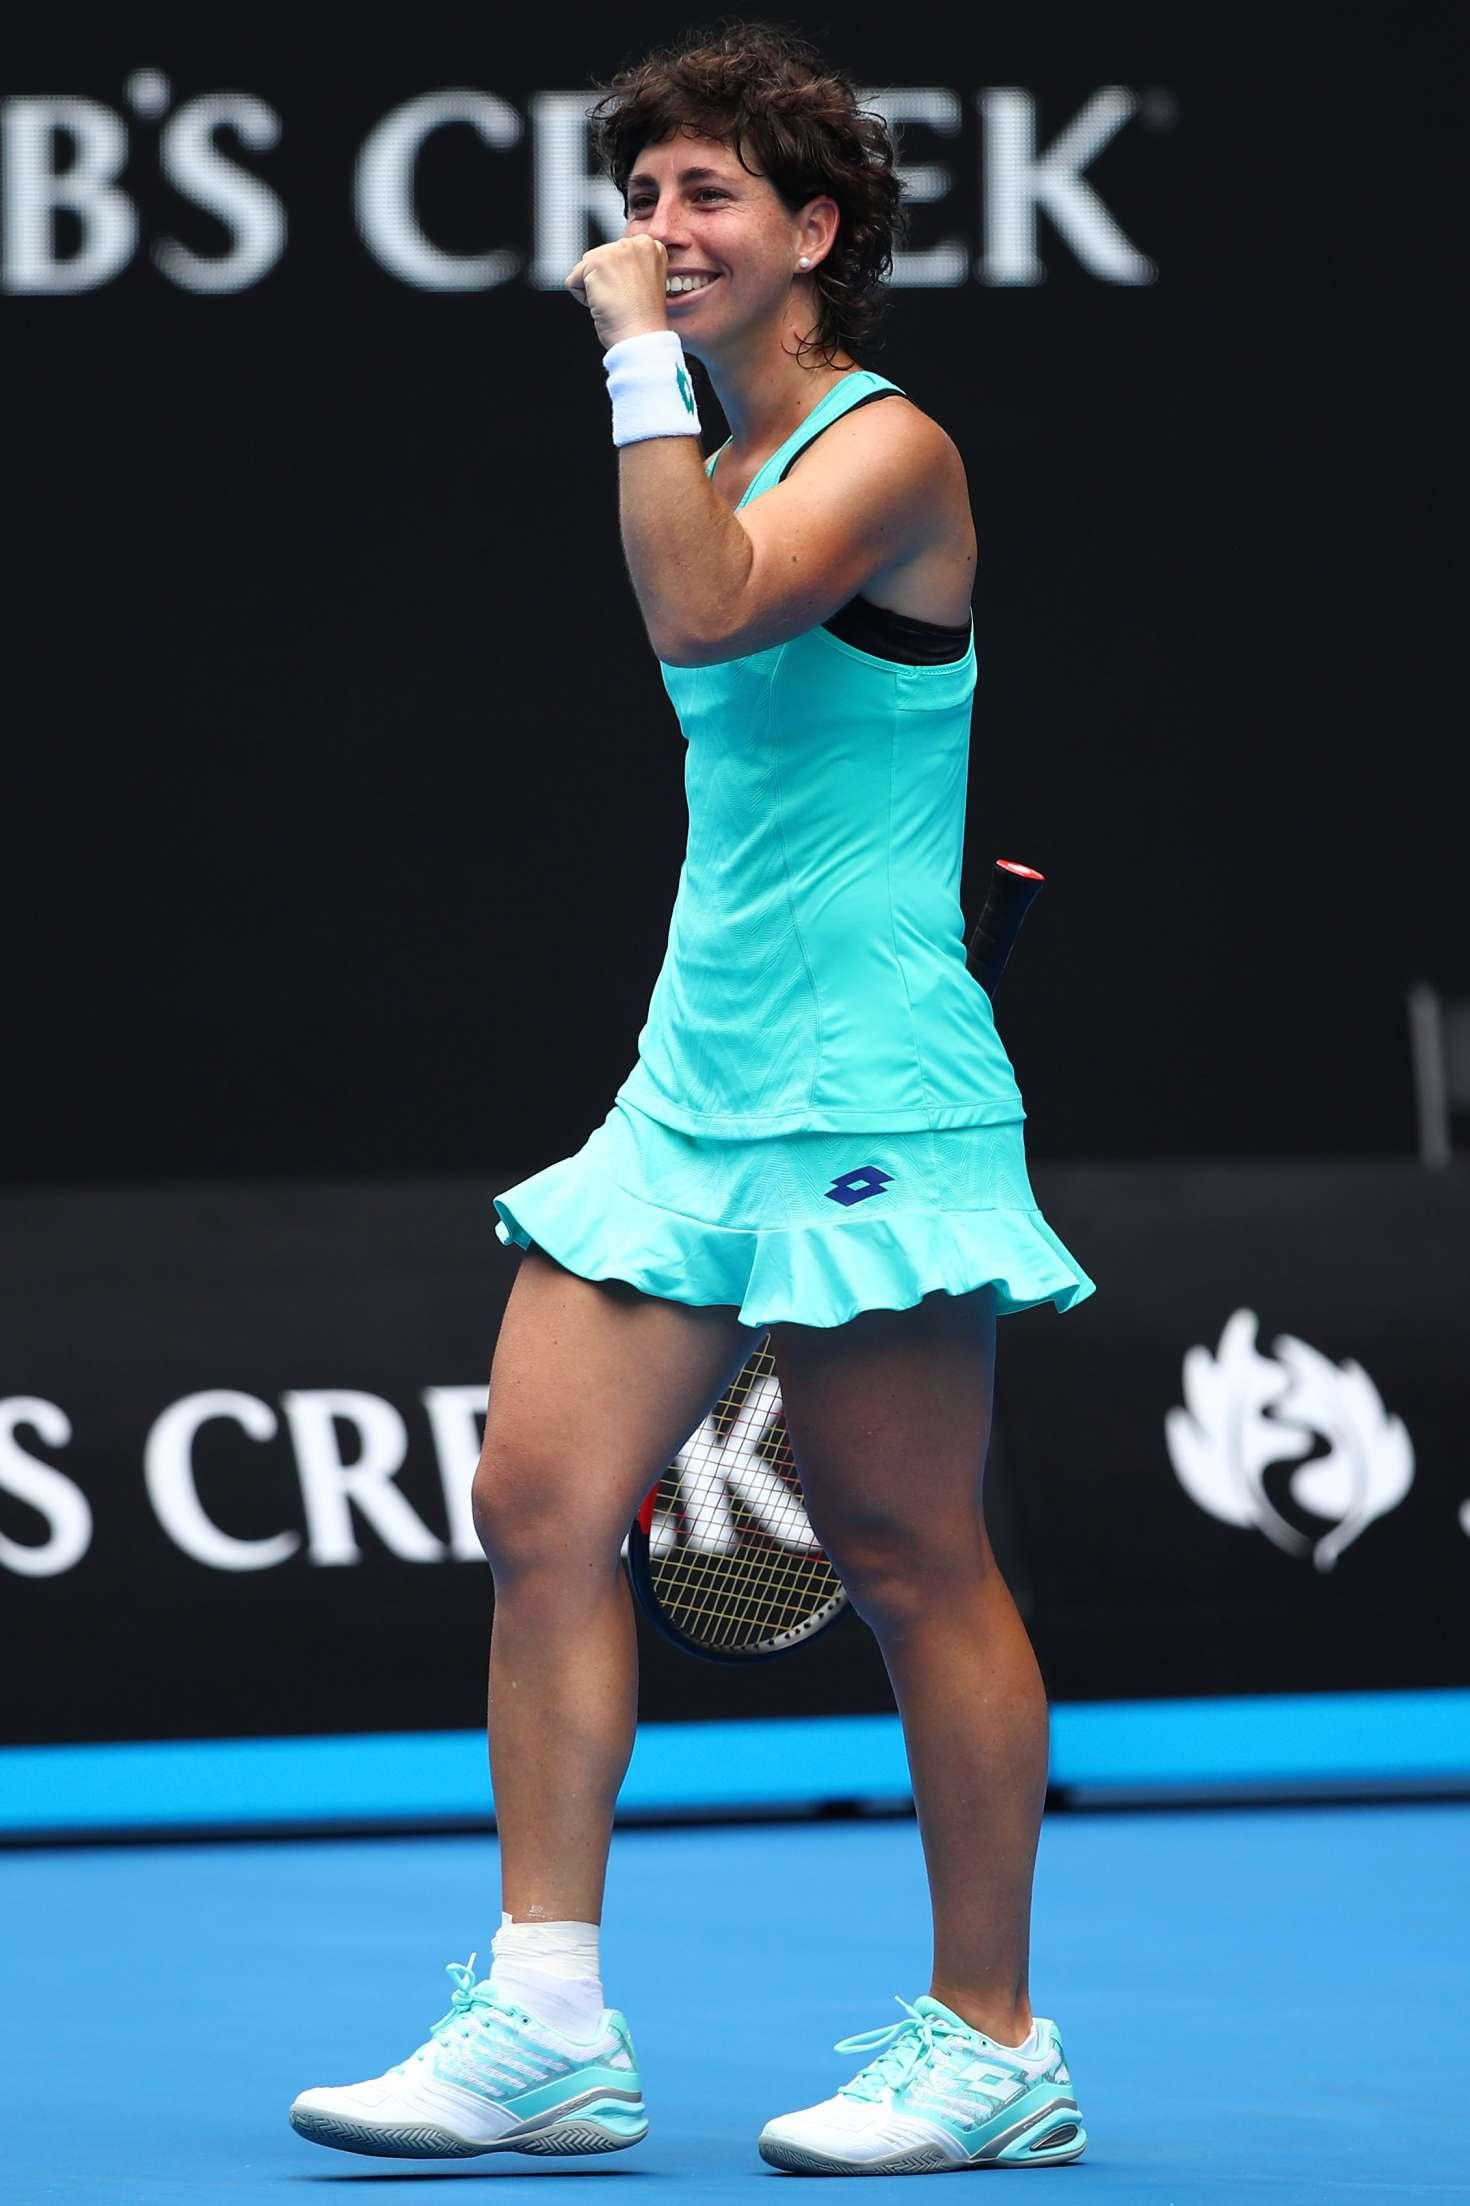 Carla Suarez Navarro: 2018 Australian Open Day 7 -07 | GotCeleb